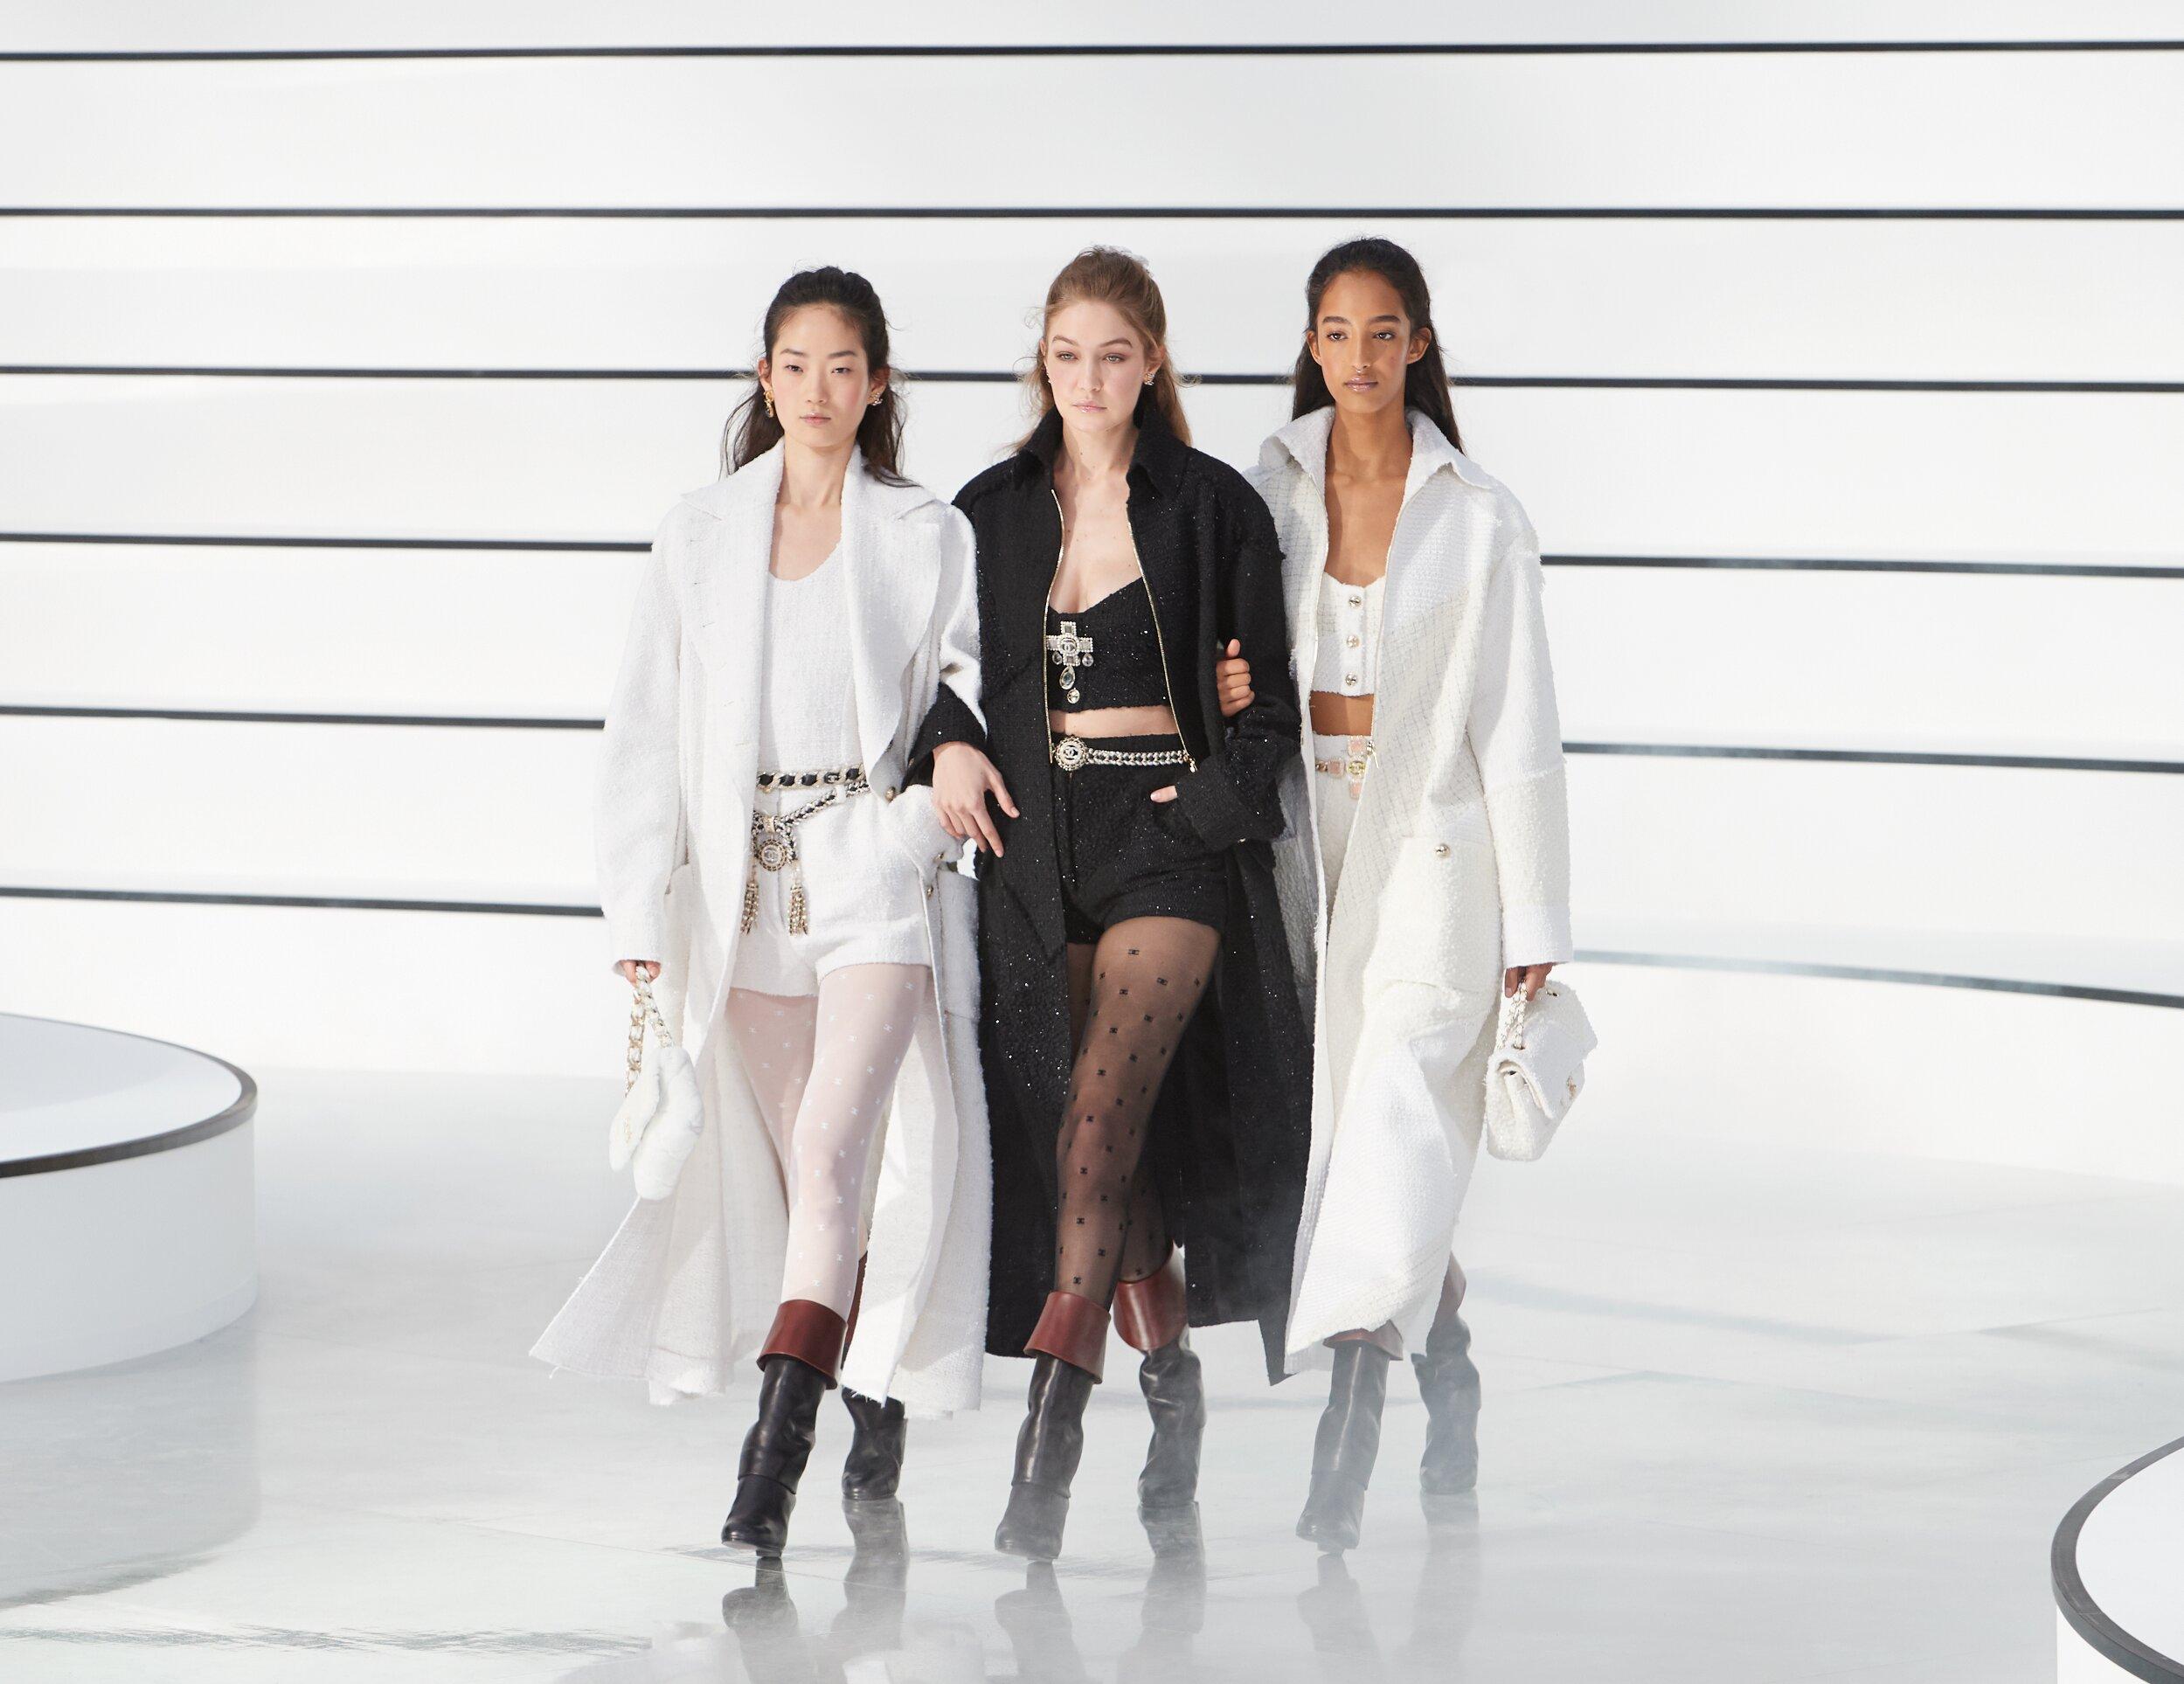 2020 Chanel Winter Runway Show